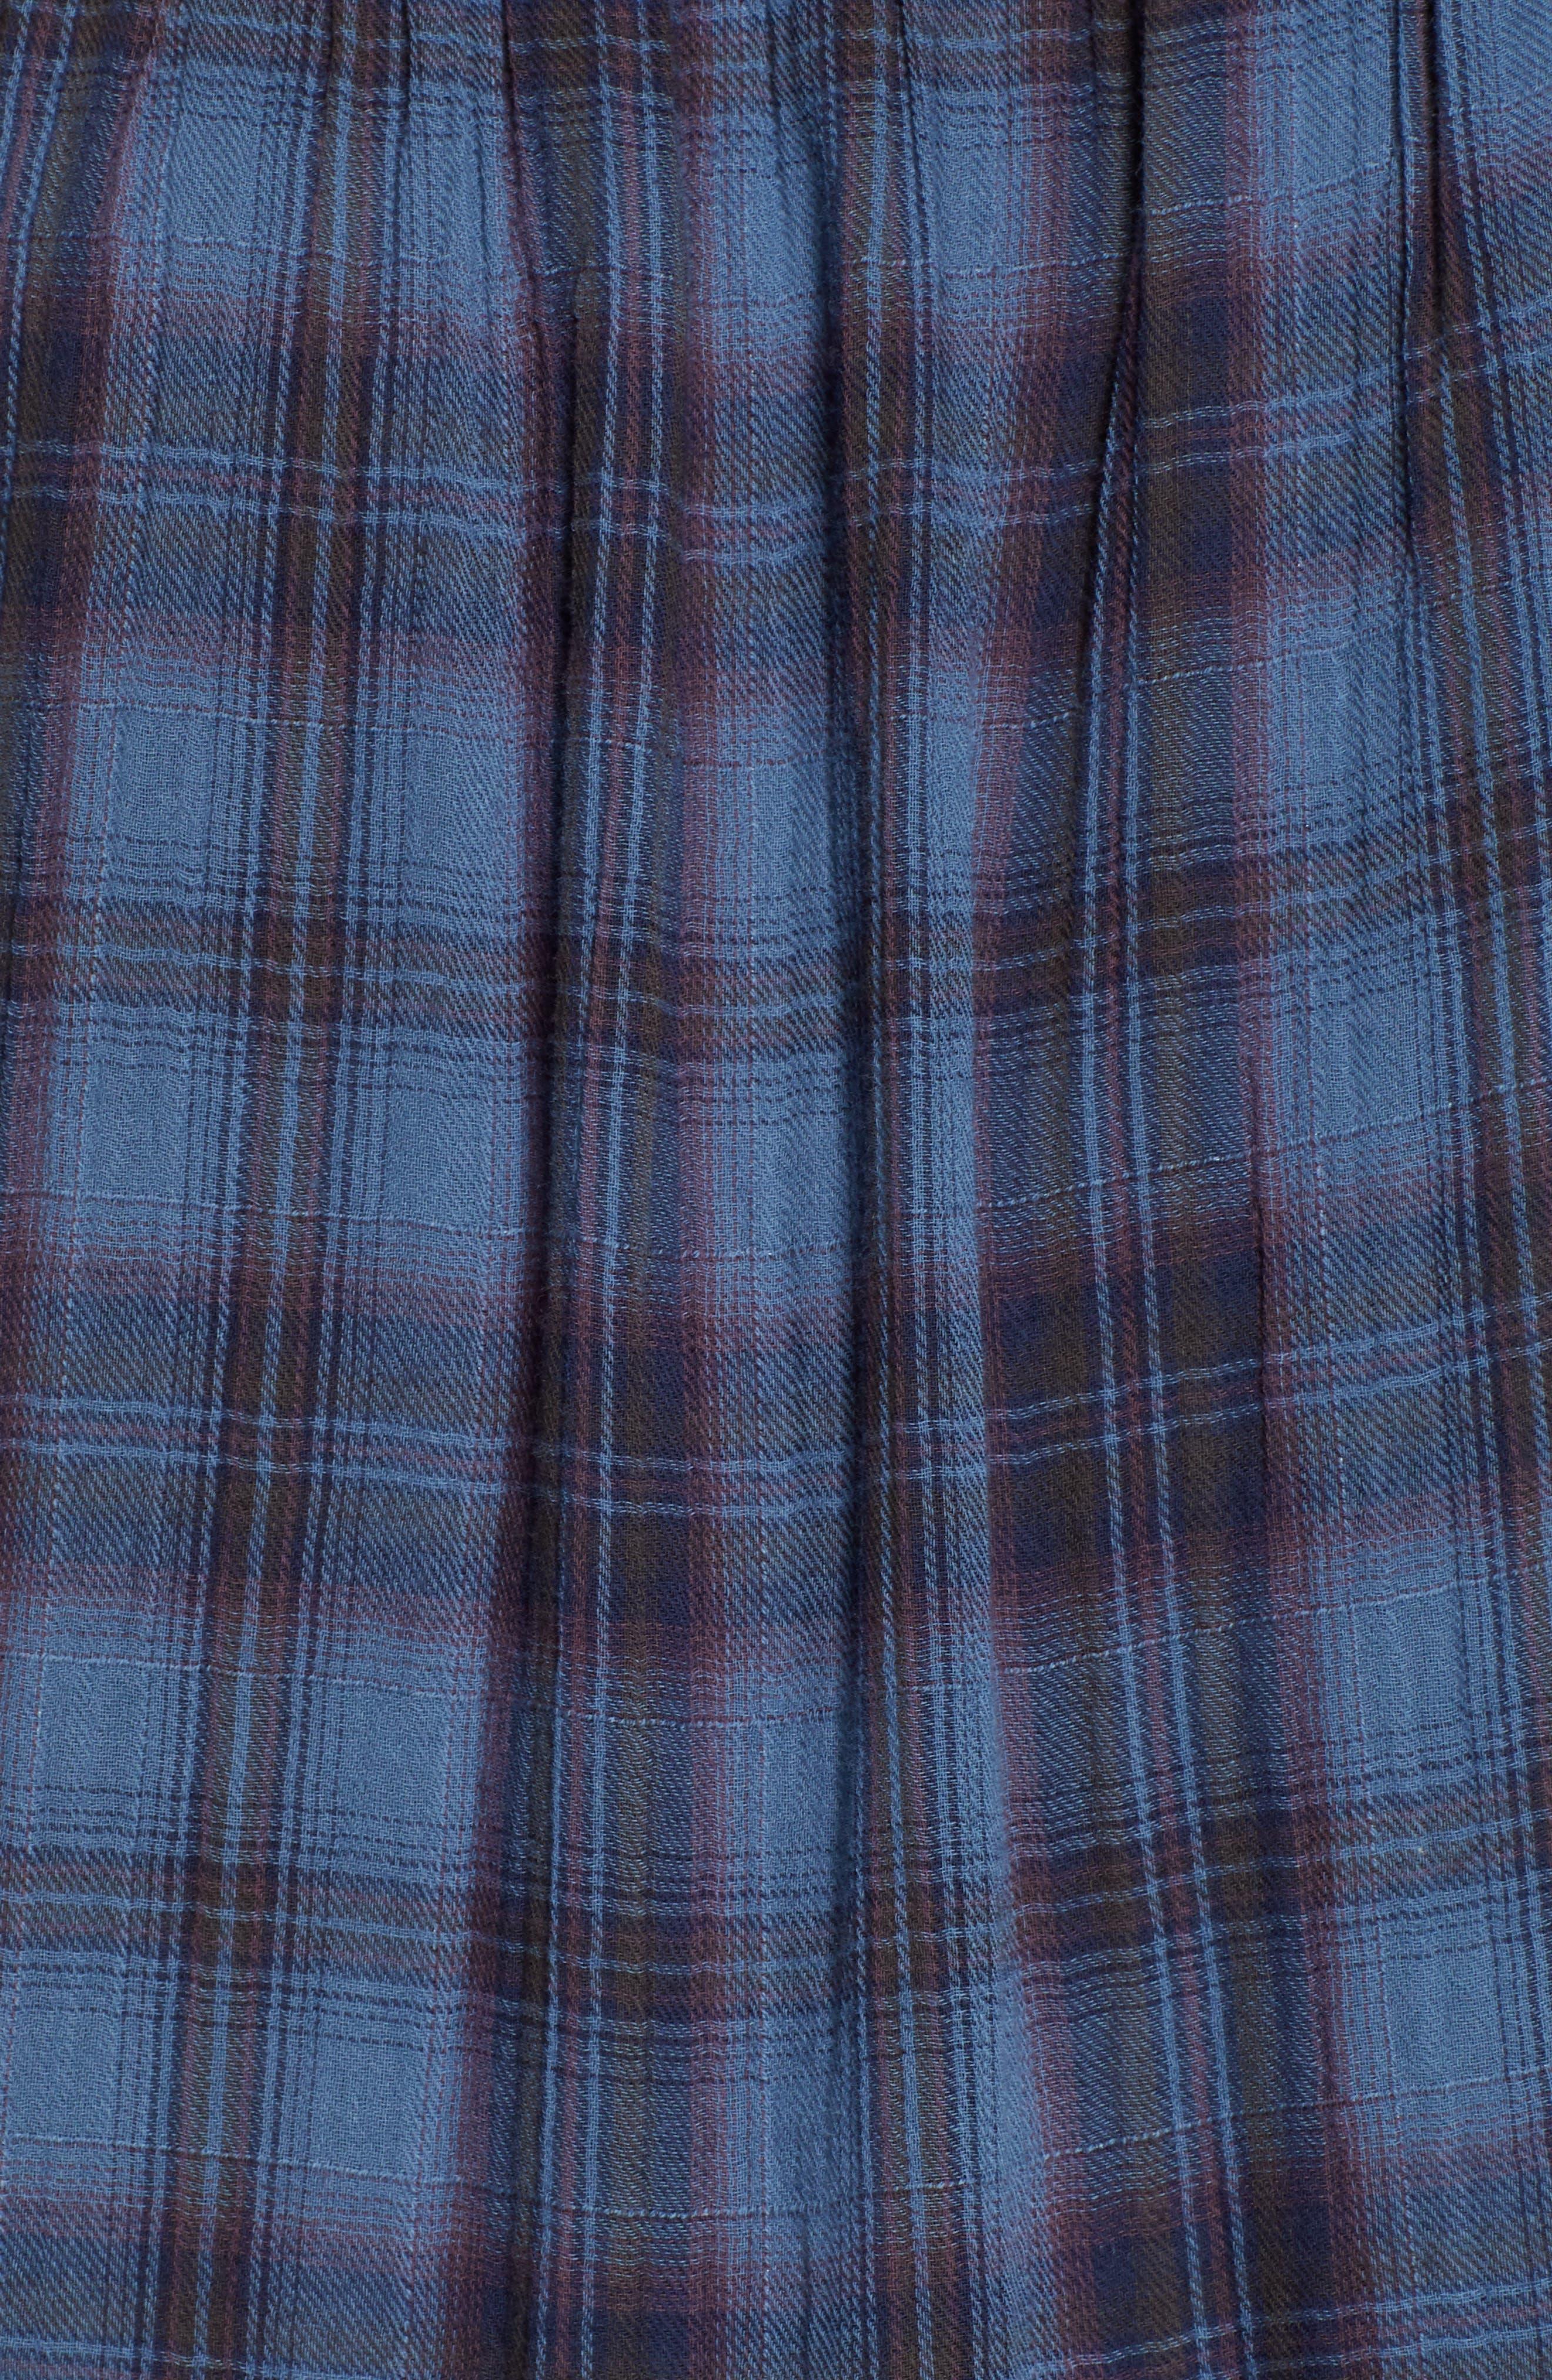 Soft Tiered Plaid Cotton Shift Dress,                             Alternate thumbnail 6, color,                             437